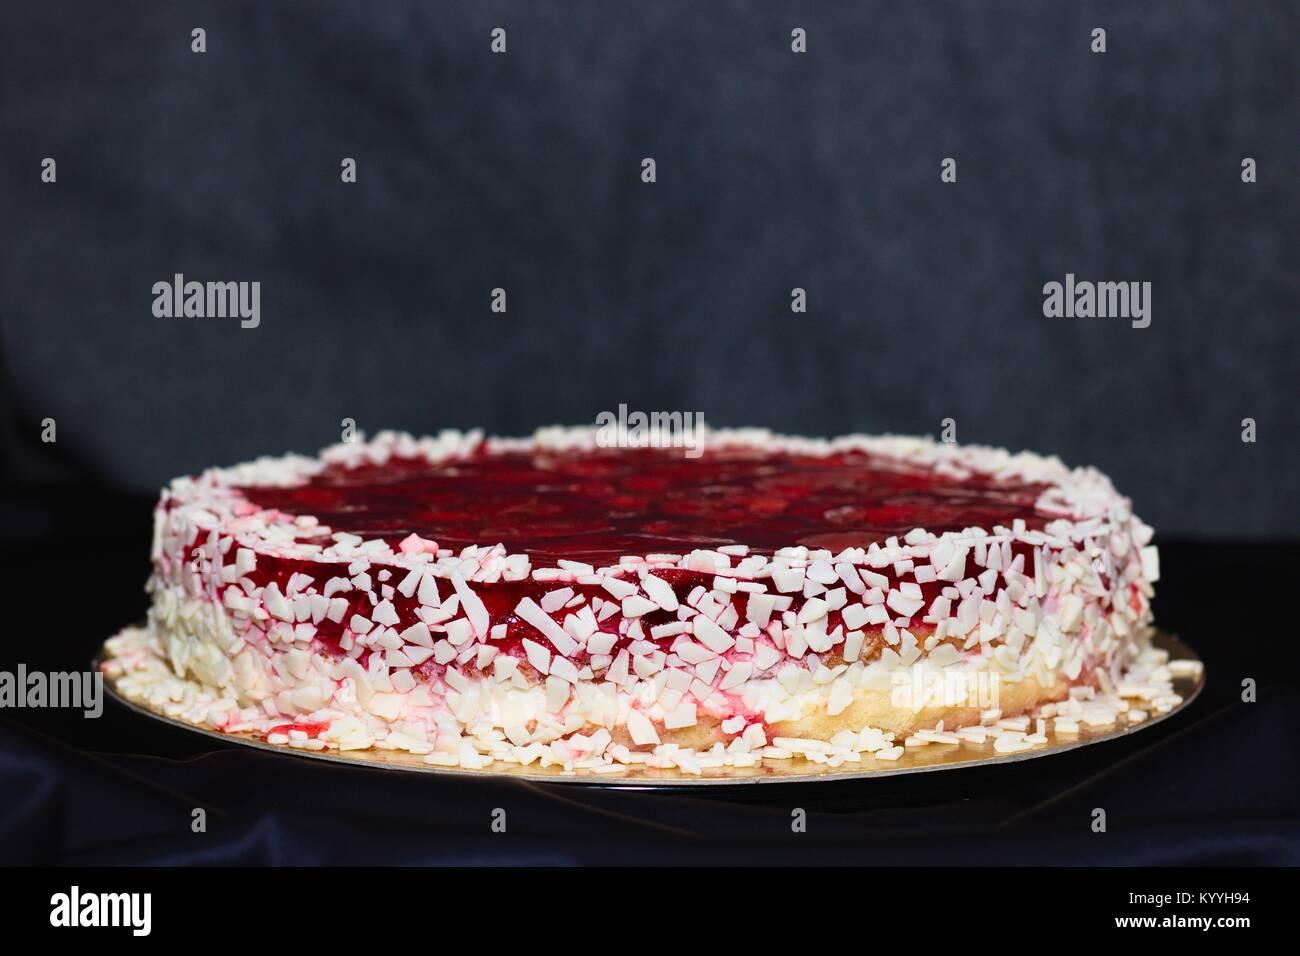 Strawberry Jelly And White Chocolate Birthday Cake On Purple Clad